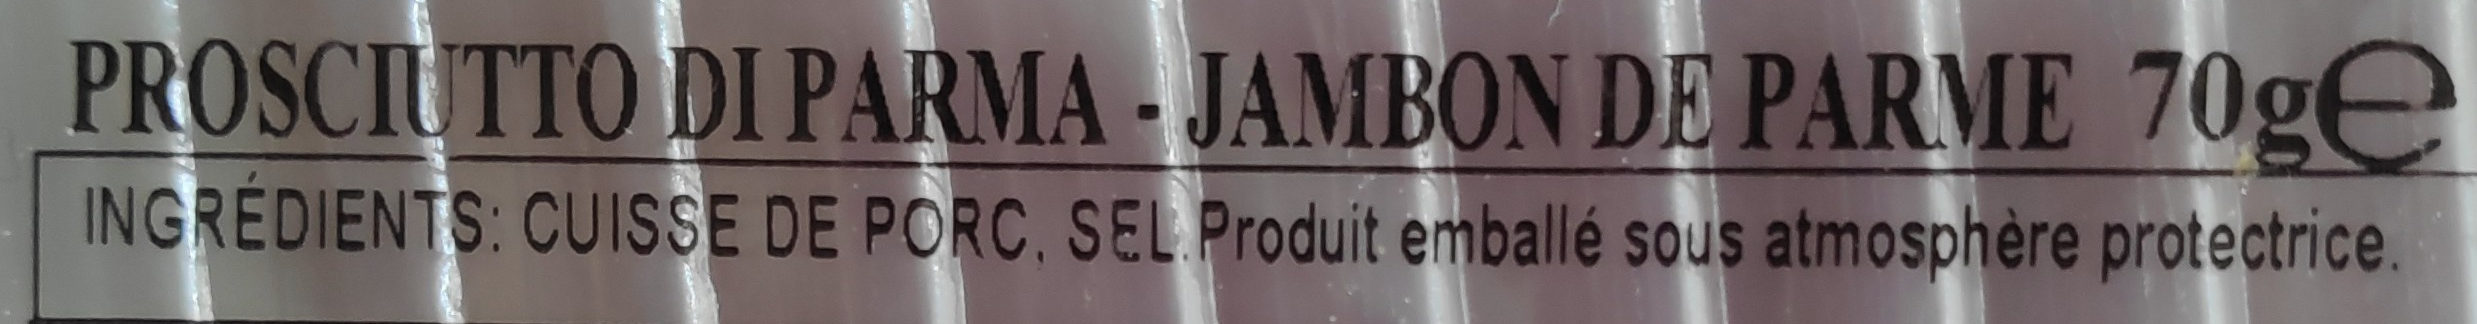 Tagliofresco - Jambon de parme - Ingredienti - fr